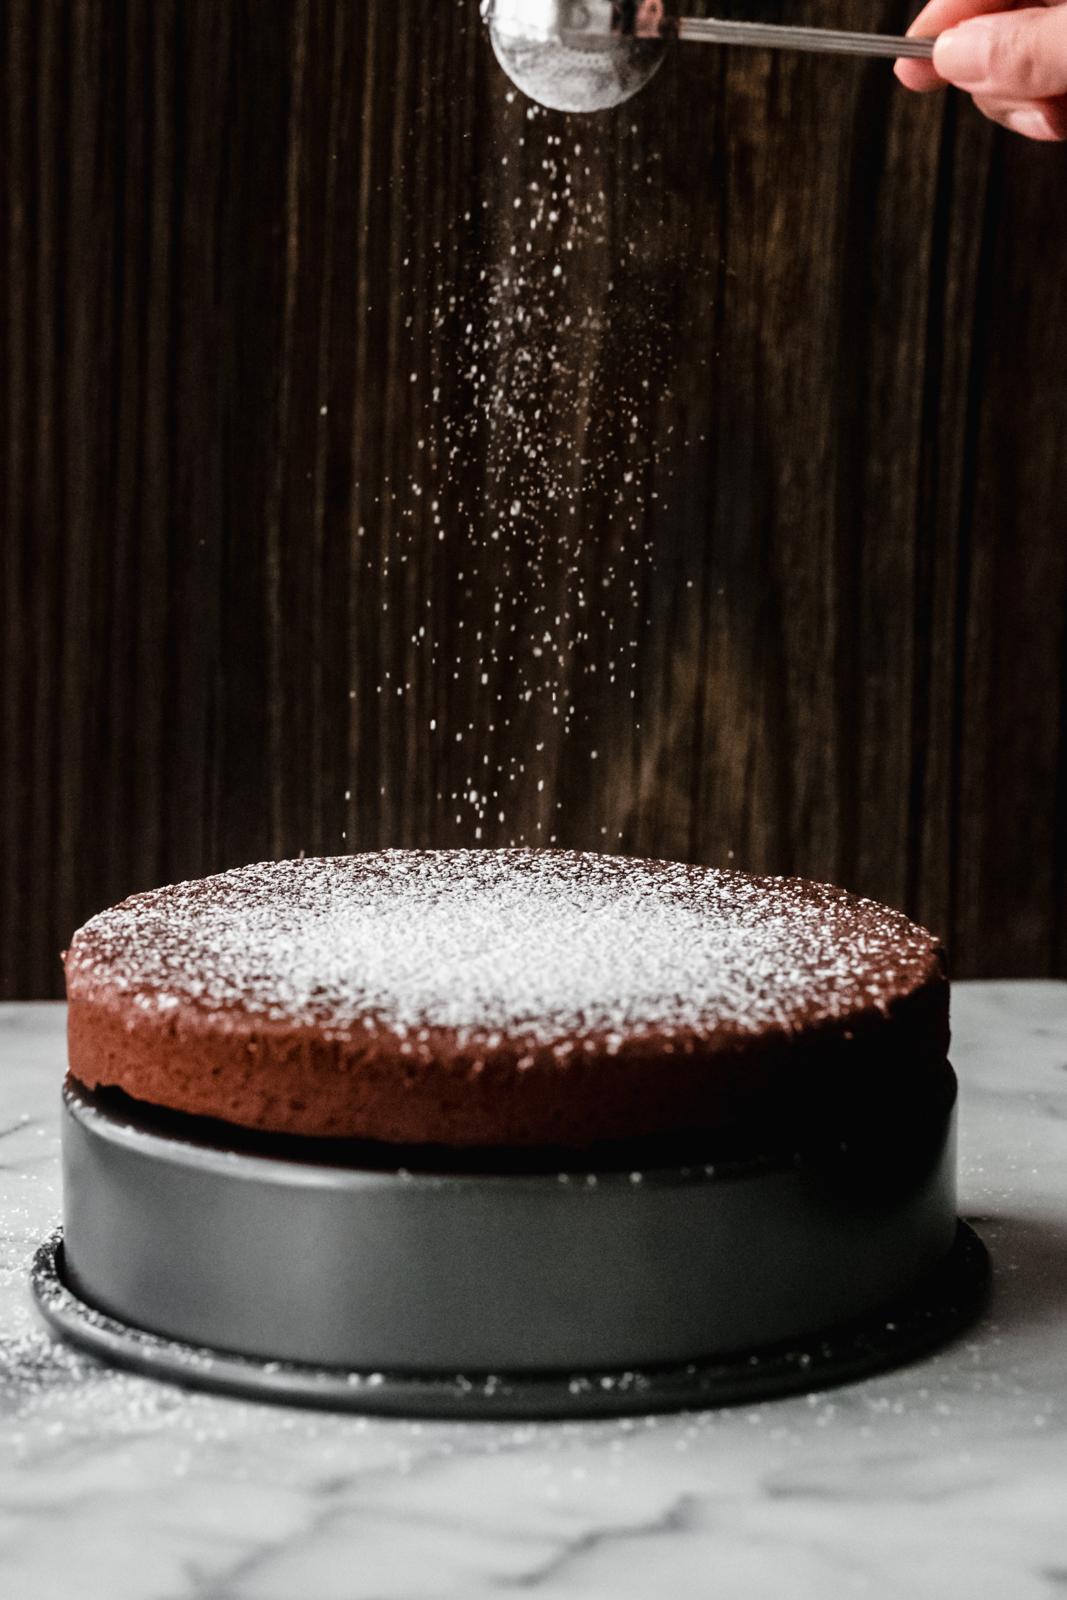 dusting prepared Torta Caprese with powdered sugar from a sugar wand